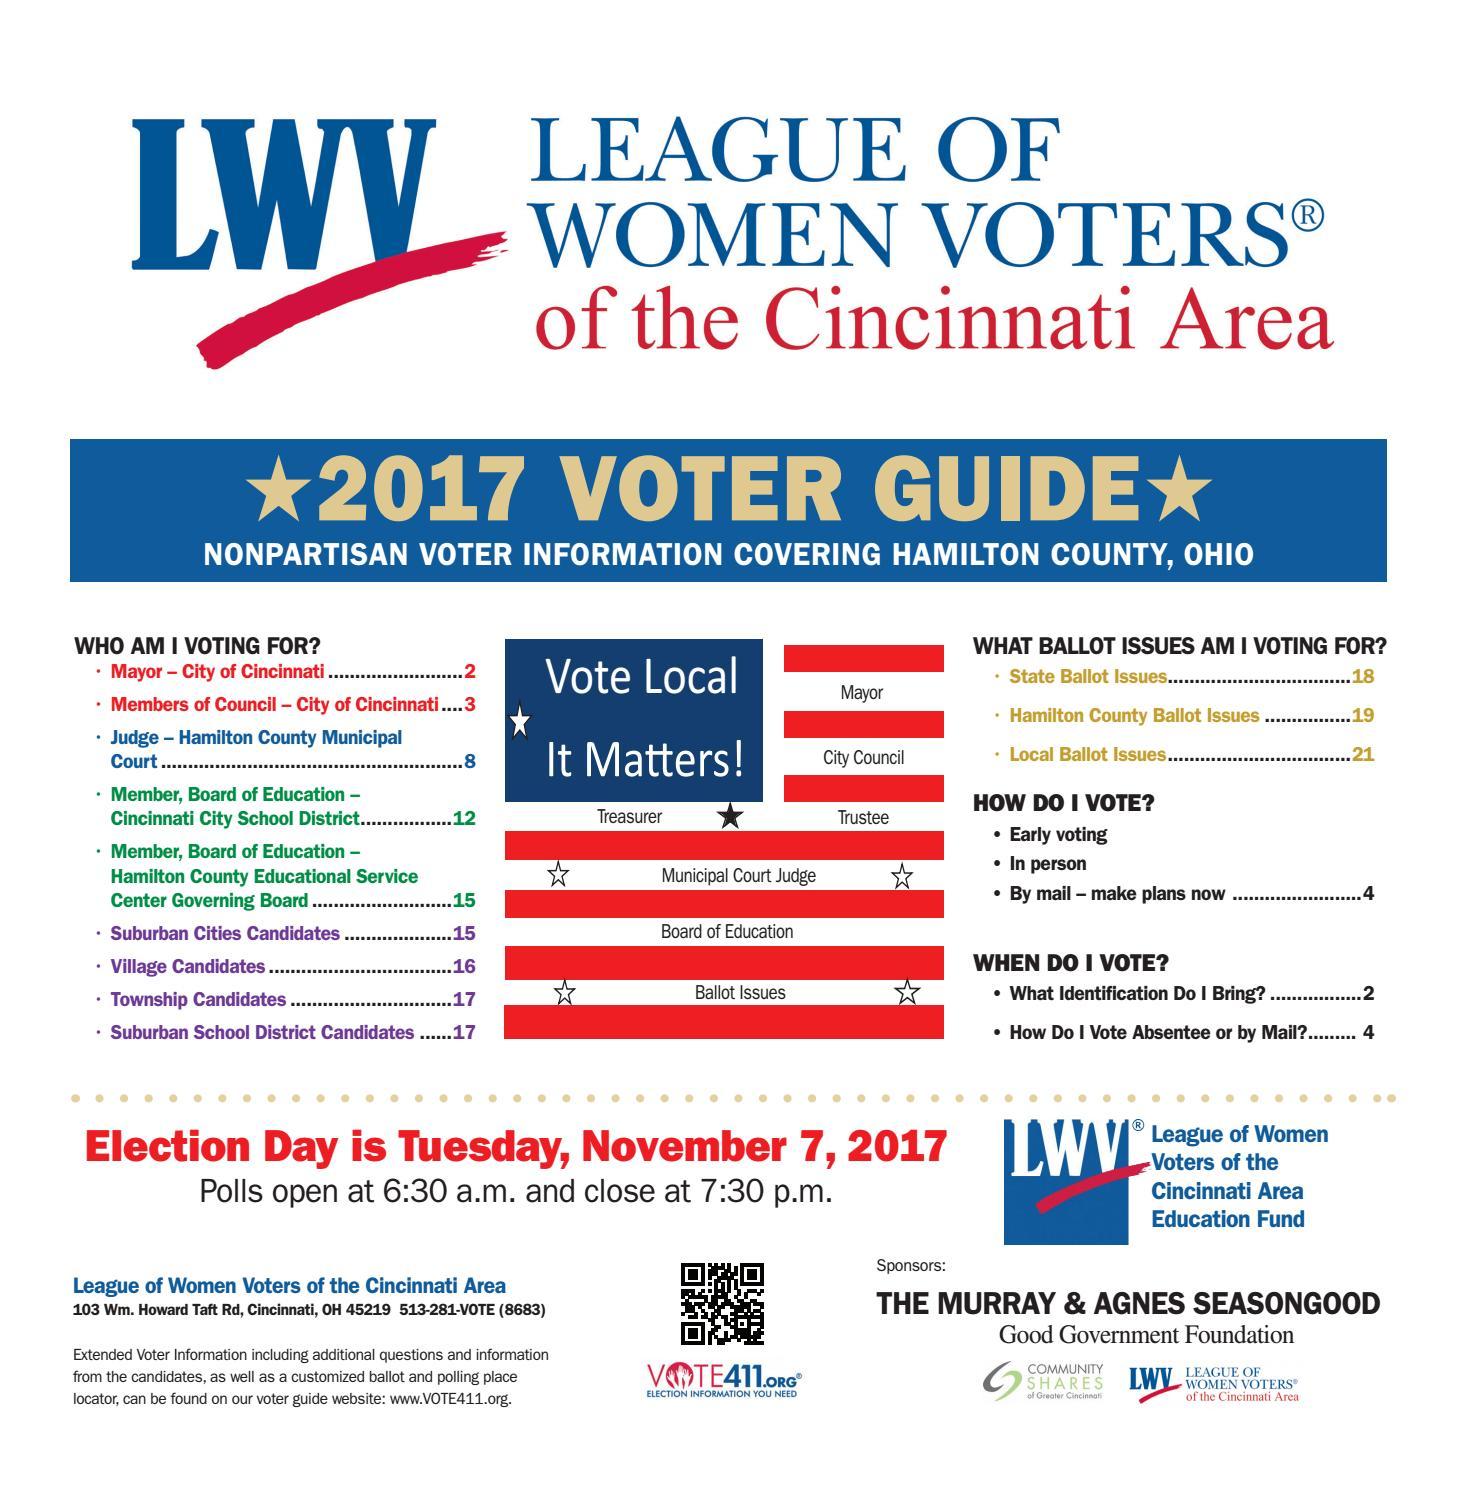 1c504bced6 League of Women Voters 2017 Voter Guide by Cincinnati CityBeat - Issuu